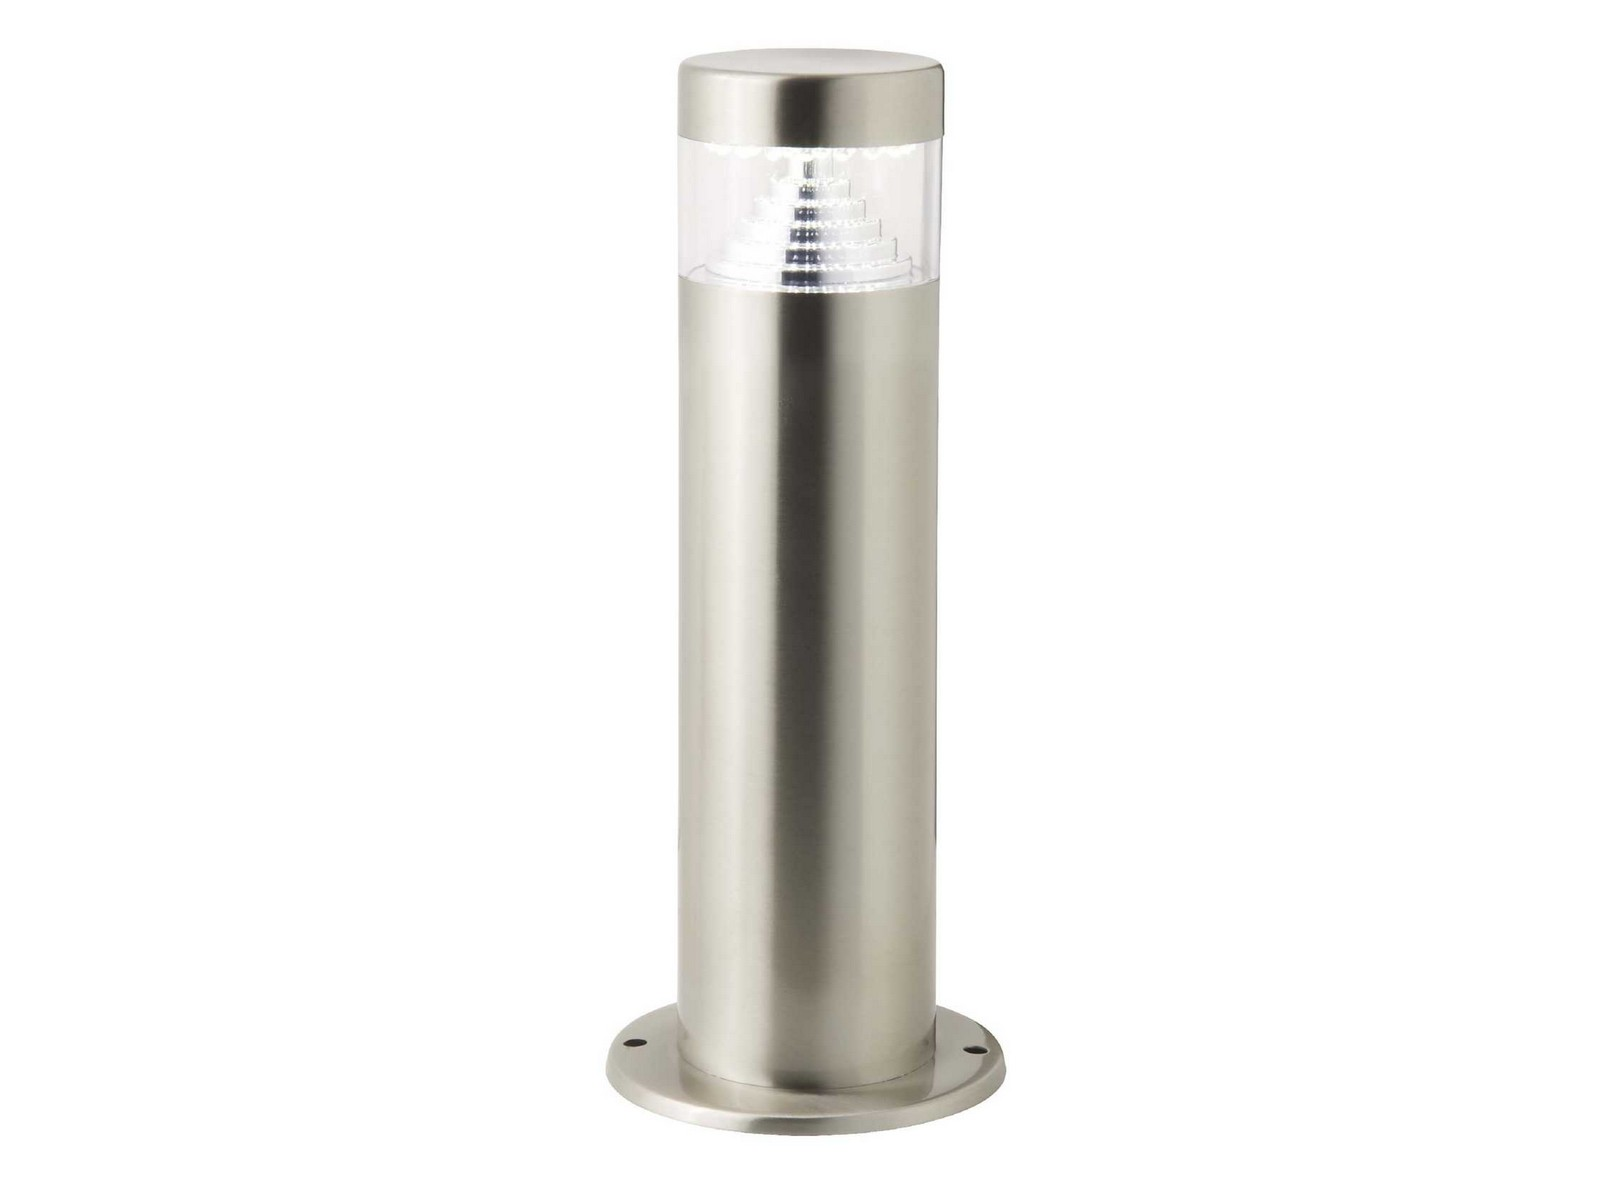 Светильник уличный AvonУличные наземные светильники<br>Вид цоколя: LED&amp;amp;nbsp;&amp;lt;div&amp;gt;Мощность лампы: 0,12W (эквивалент 1,2W)&amp;lt;/div&amp;gt;&amp;lt;div&amp;gt;Количество ламп: 30&amp;amp;nbsp;&amp;lt;/div&amp;gt;&amp;lt;div&amp;gt;Наличие ламп: да&amp;lt;/div&amp;gt;<br><br>Material: Металл<br>Высота см: 30